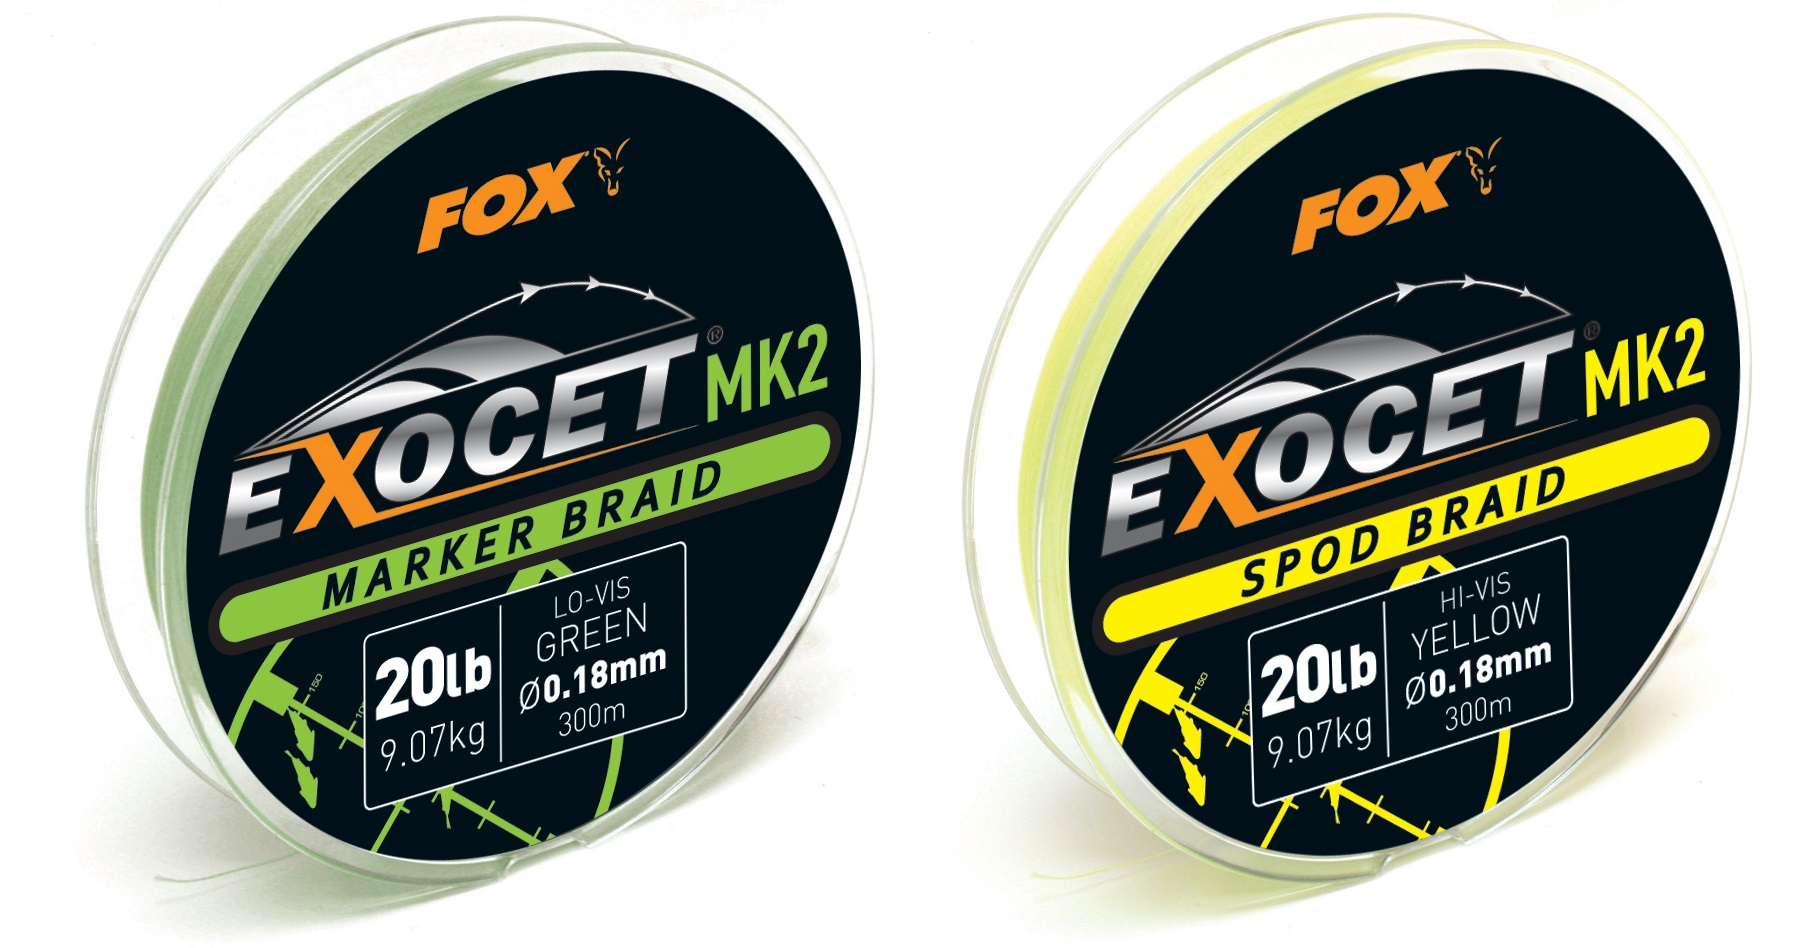 Fox Шнур  Exocet MK2 SPOD & MARKER BRAID